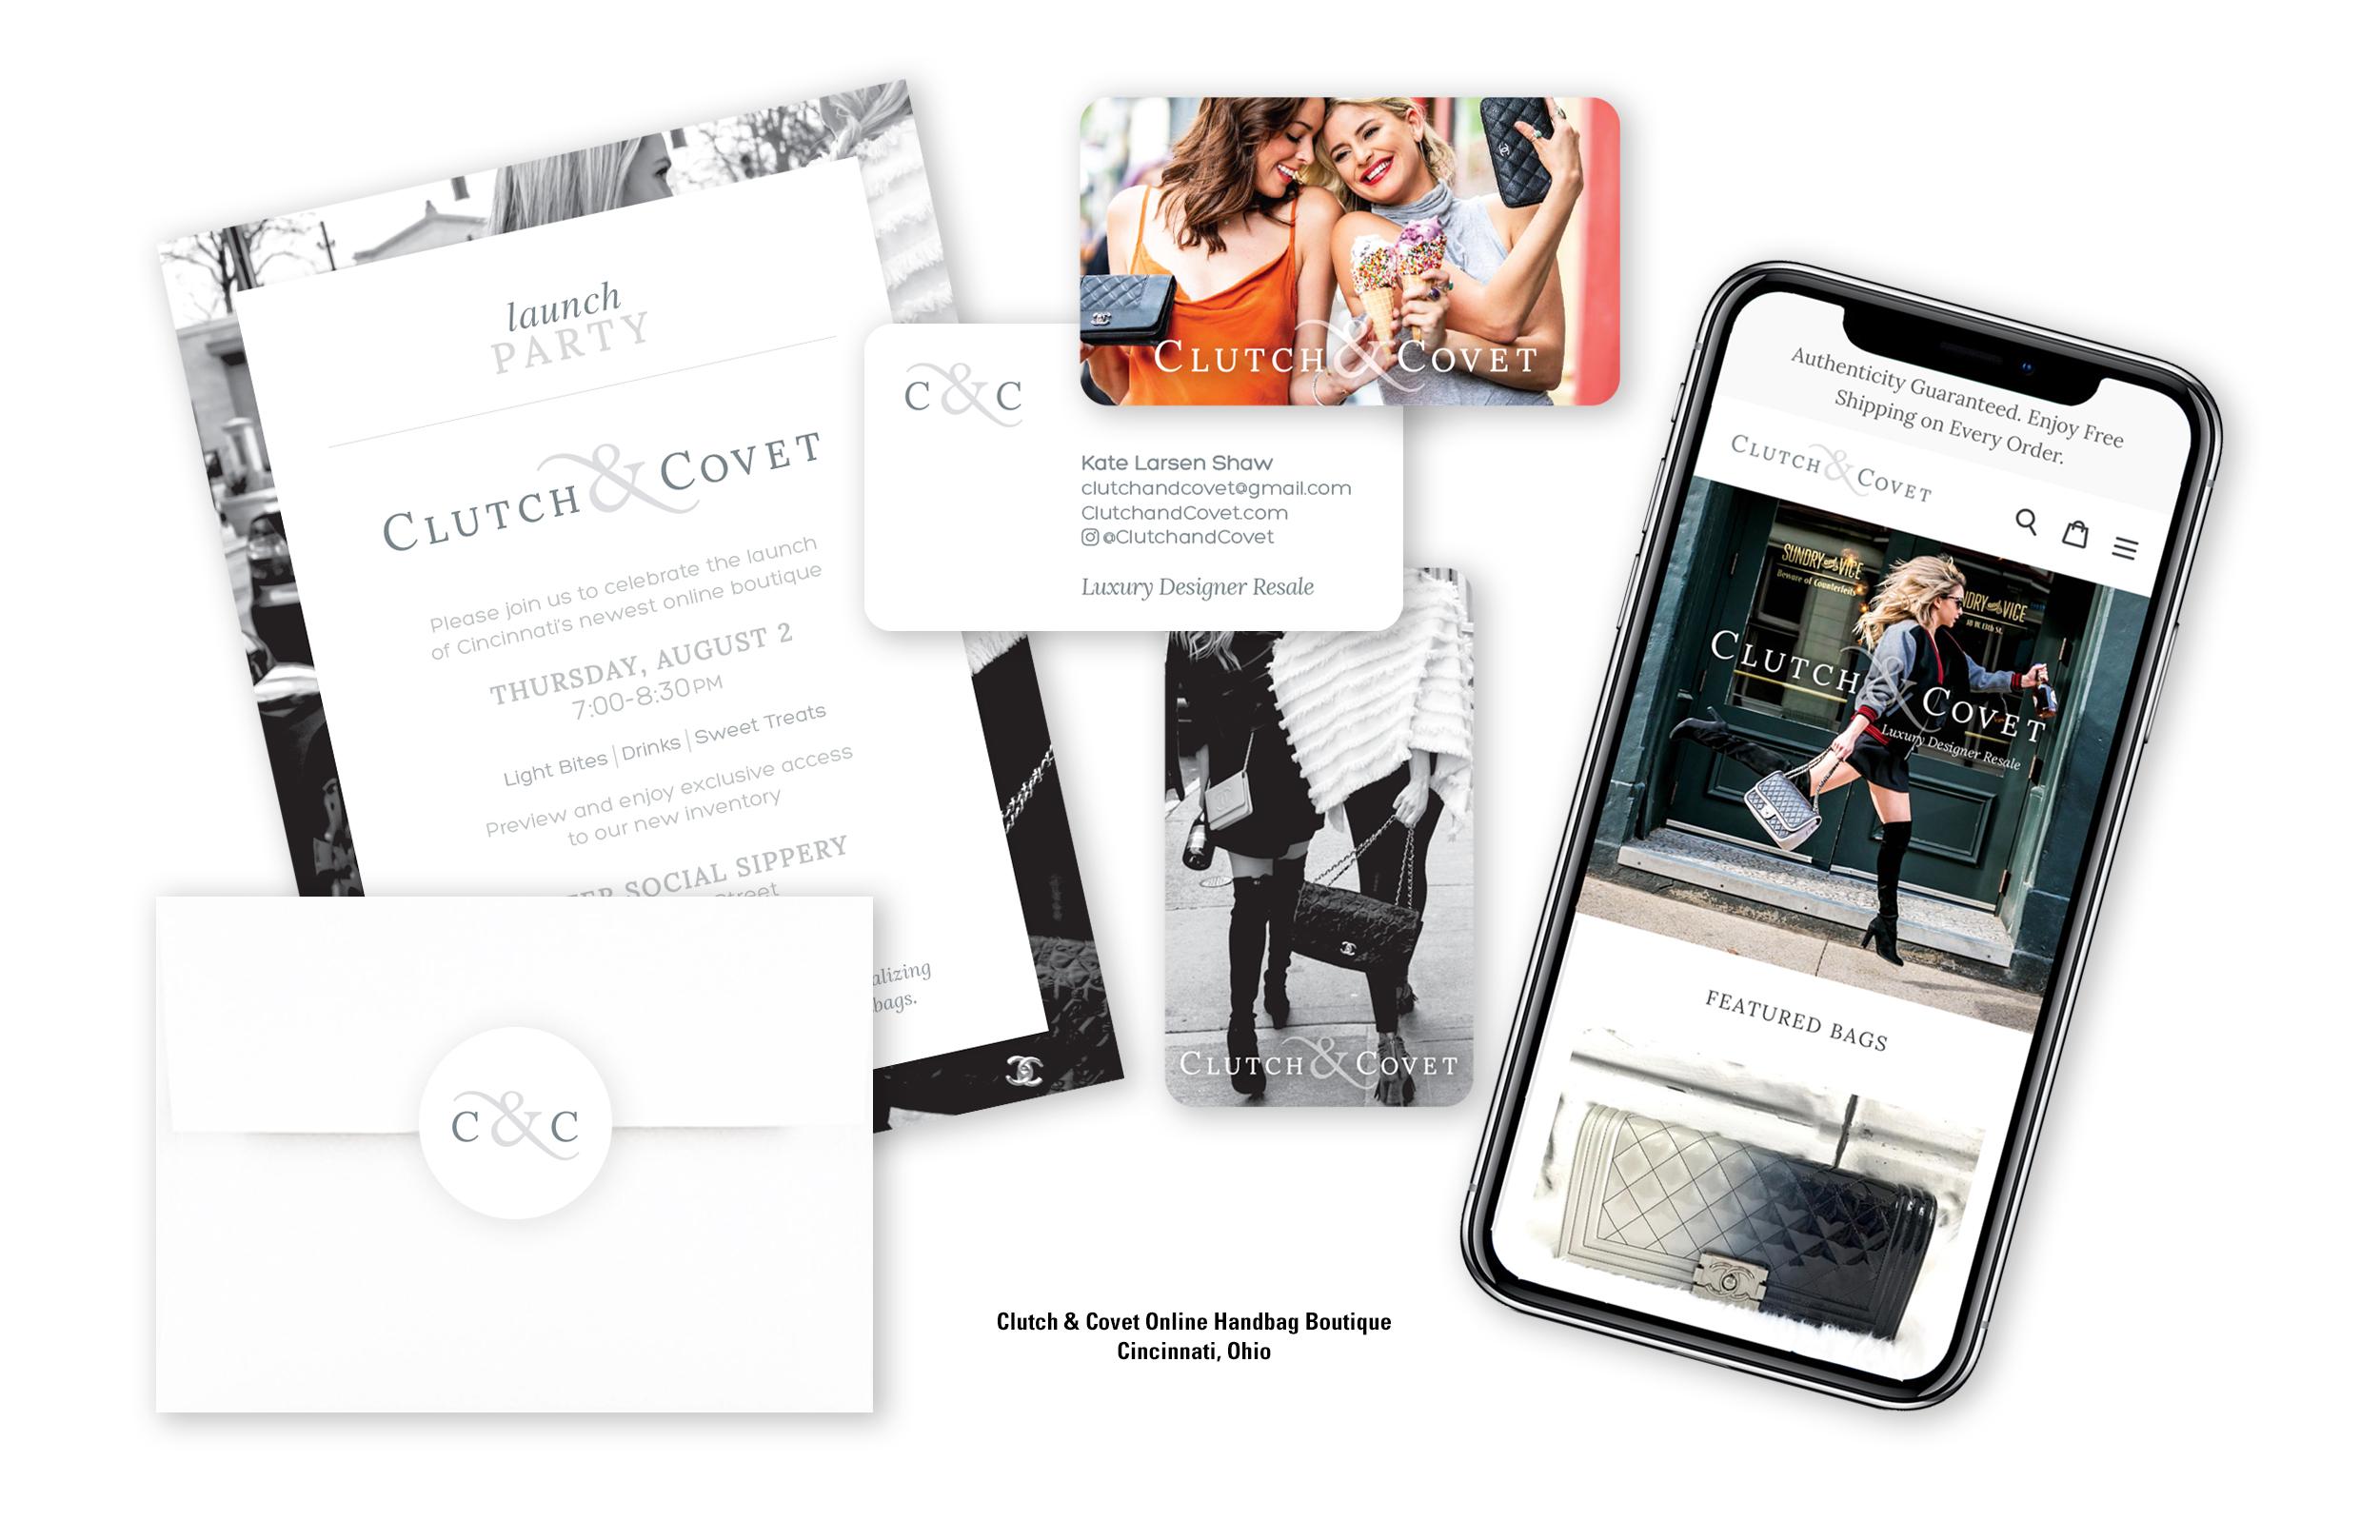 Clutch & Covet Online Handbag Boutique Identity